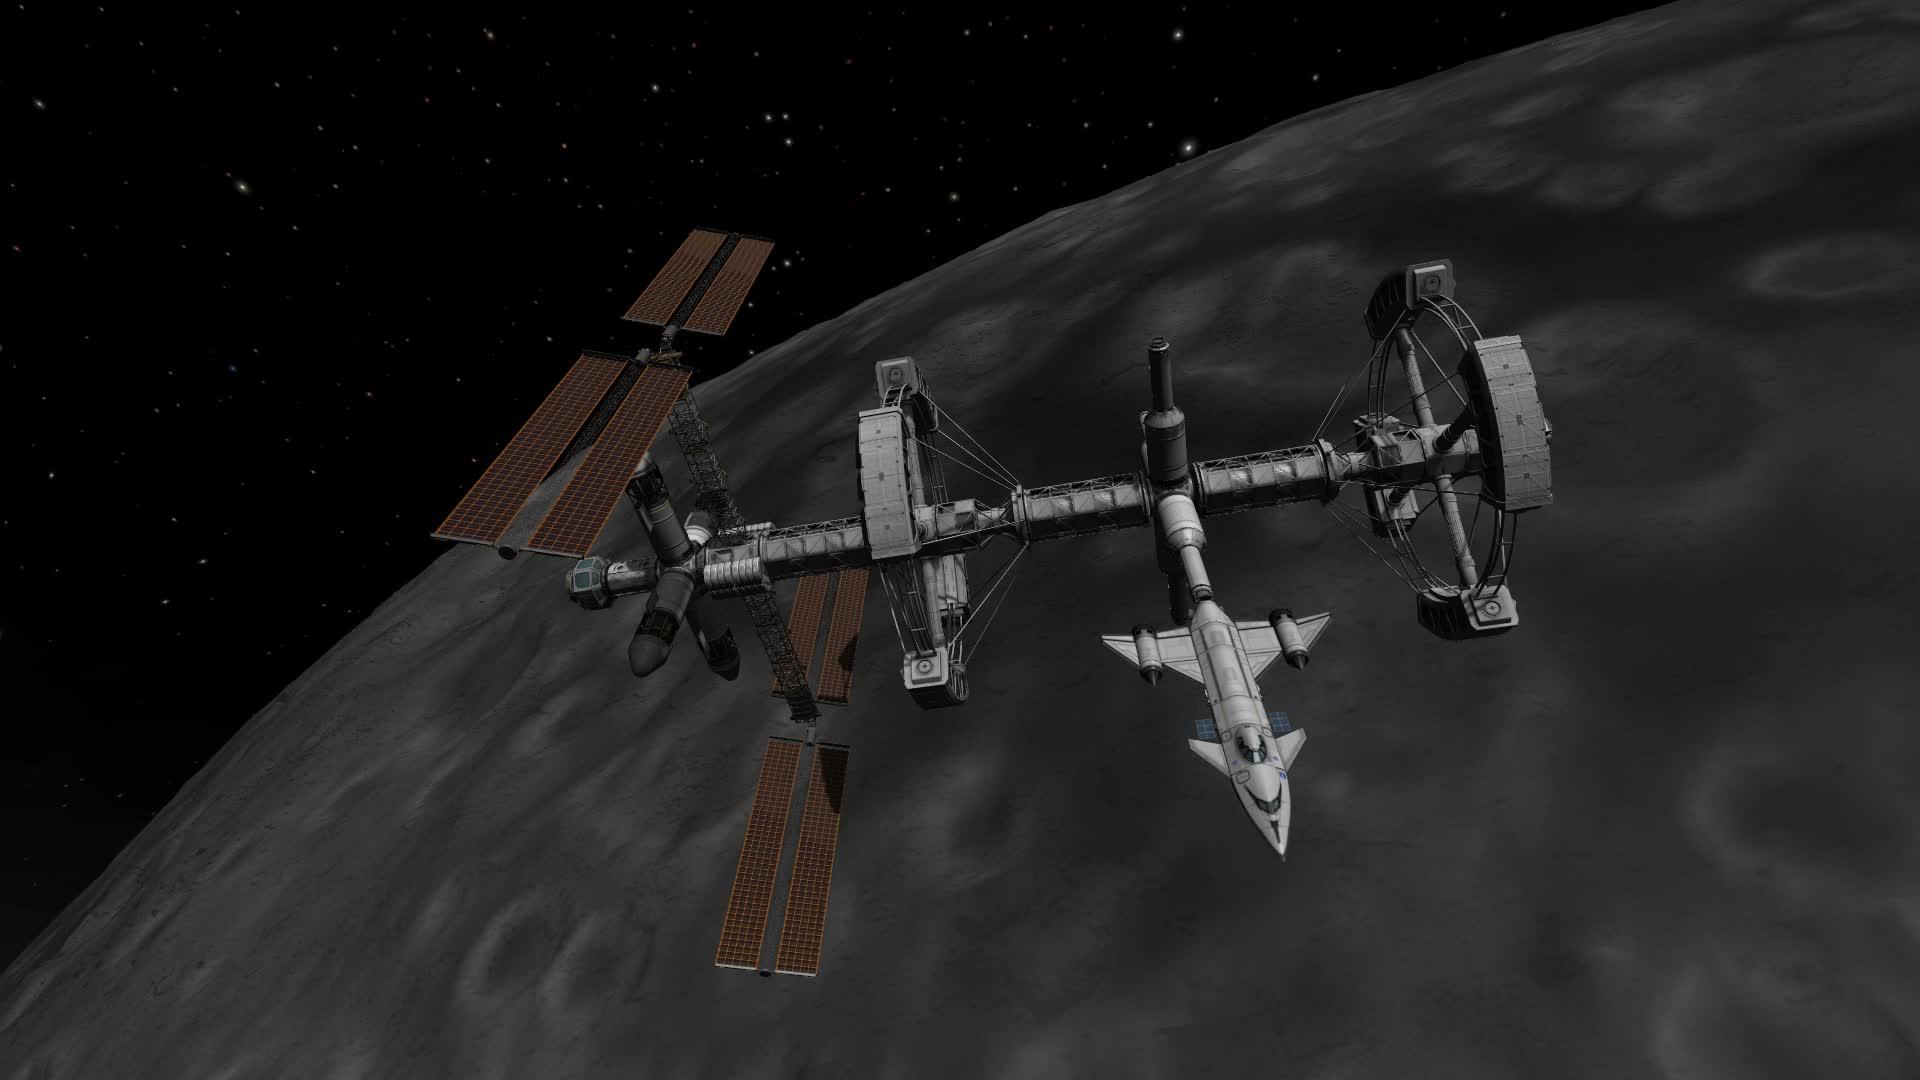 Kerbal Space Program Lunar station GIFs